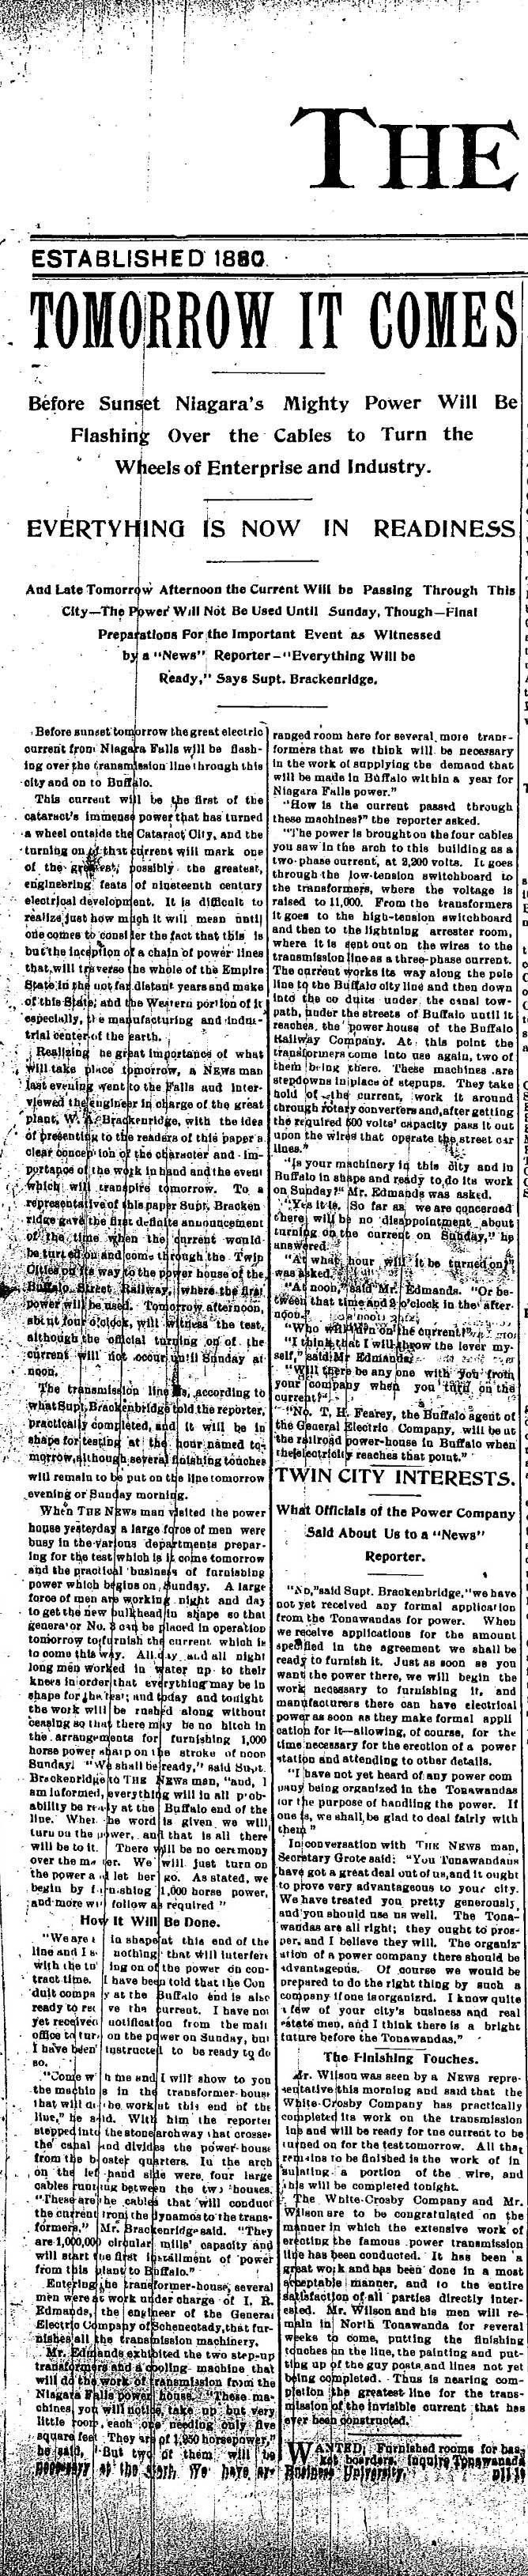 Tomorrow It Comes, electricity to be transmitted from Niagara Falls to Buffalo, article (Tonawanda News, 1896-11-13).jpg